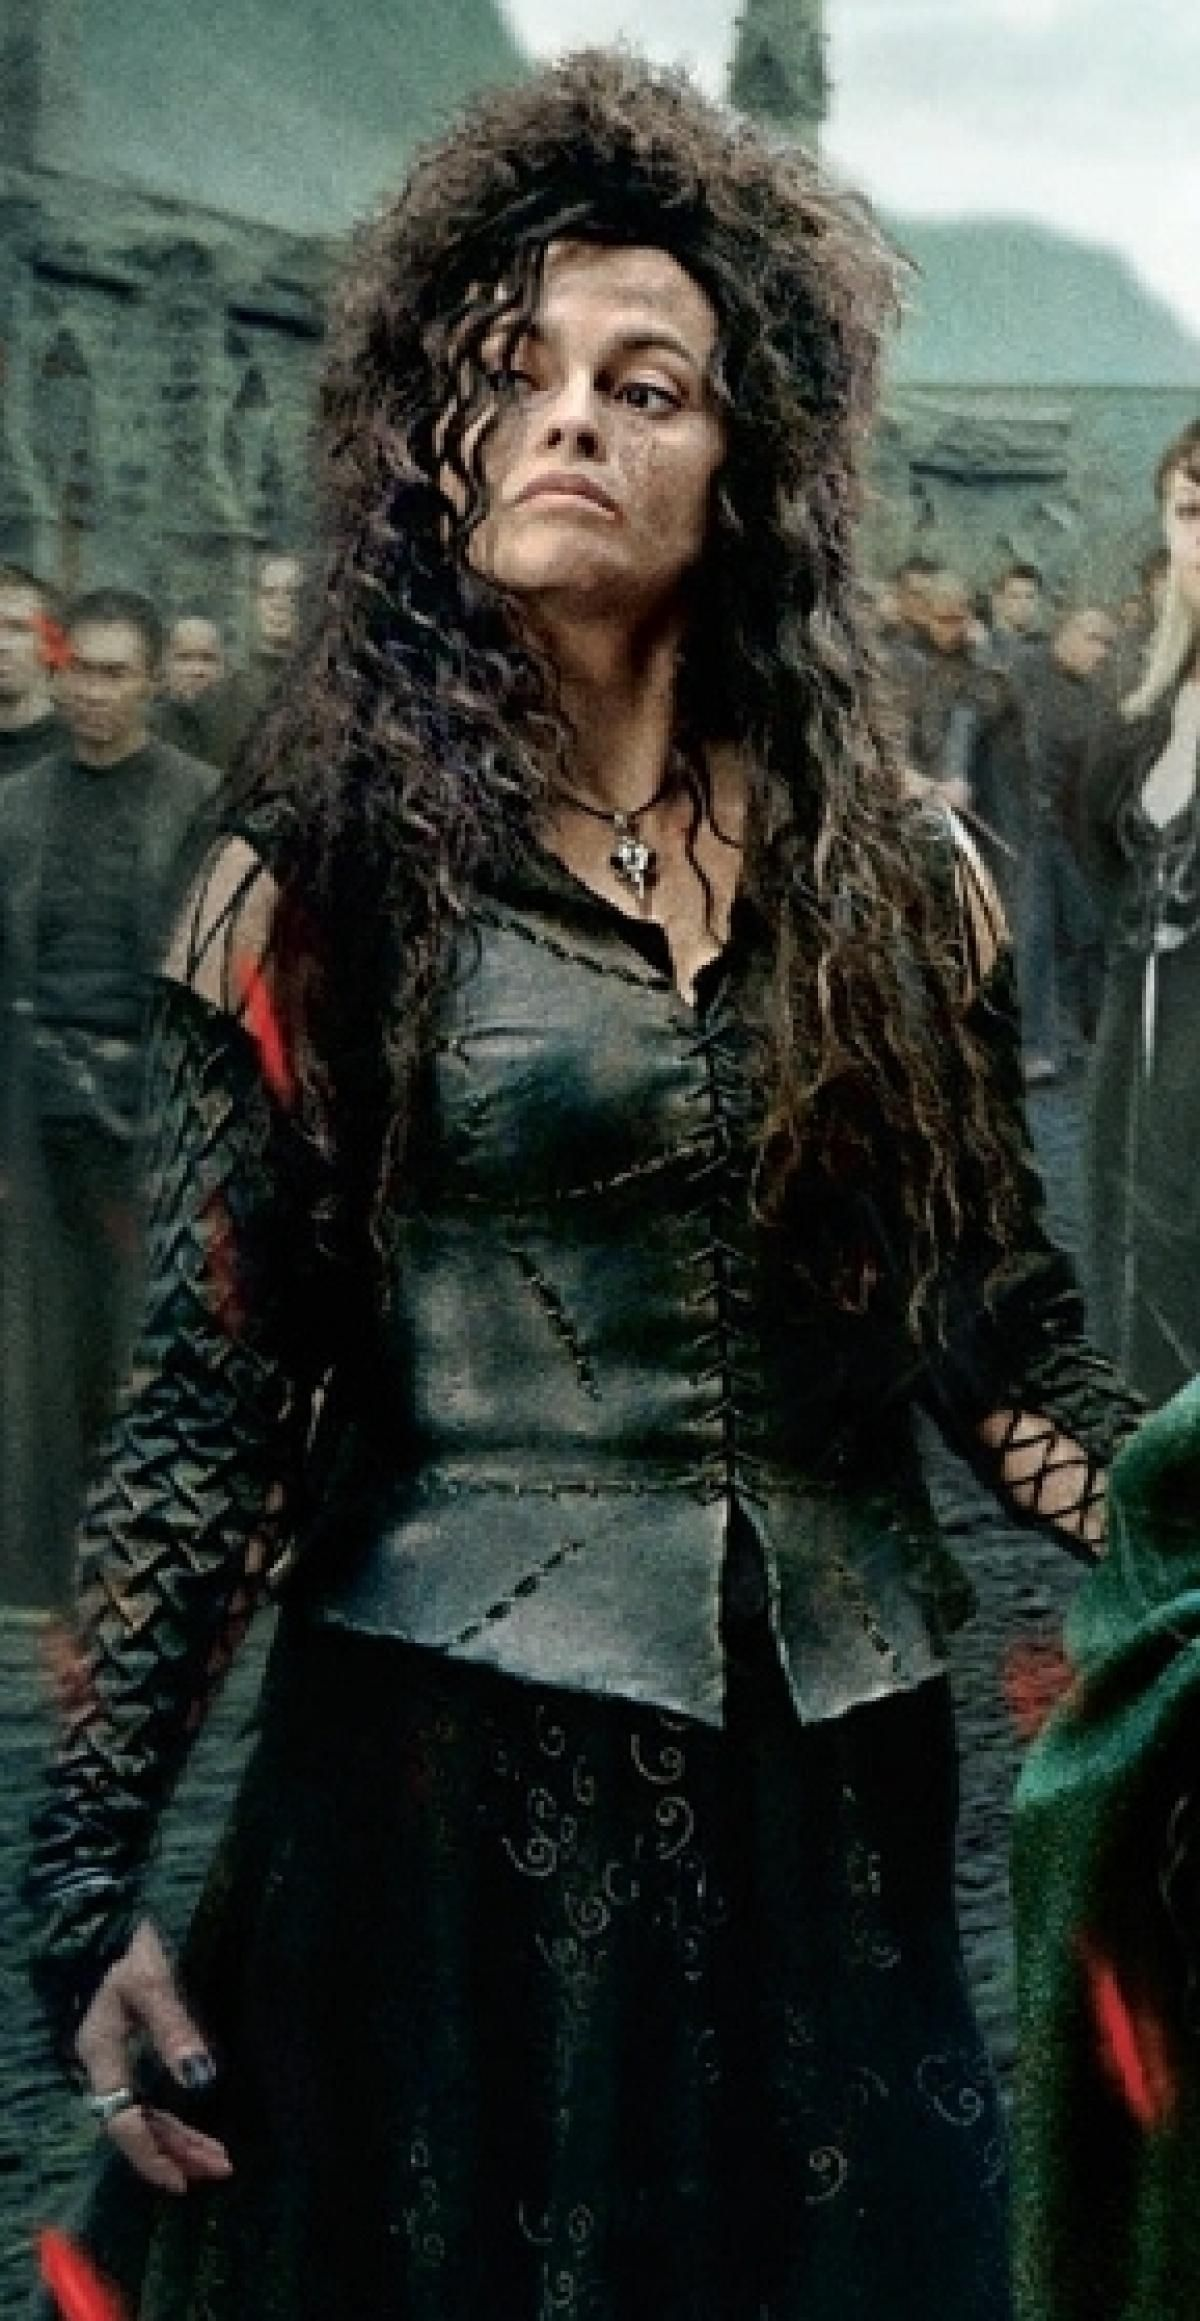 Best Harry Potter Cosplay Harry Potter Characters Bellatrix Lestrange Harry Potter Cosplay